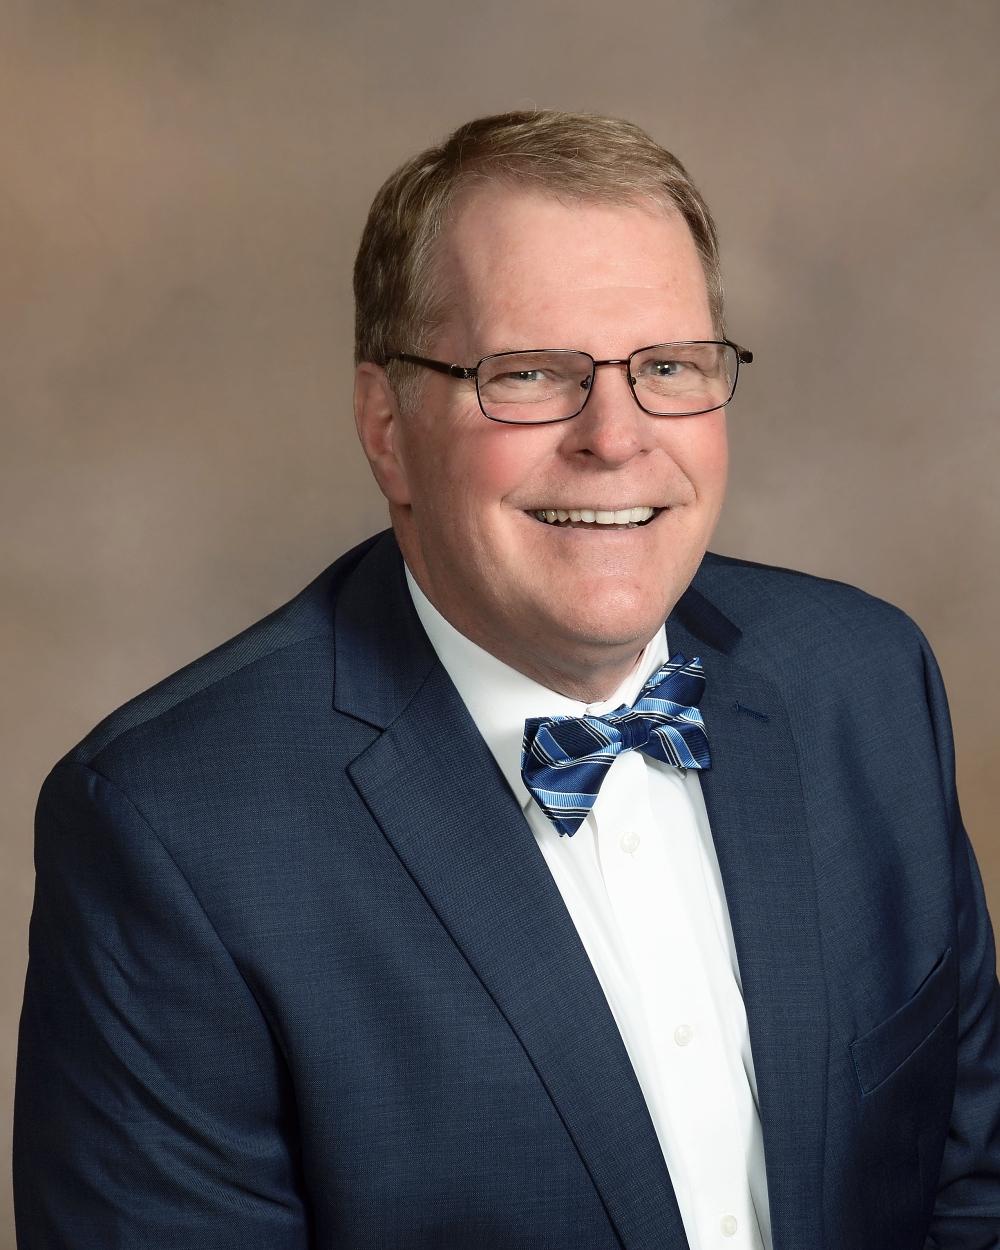 Rev. Kevin Sills - Pastor Since 2017